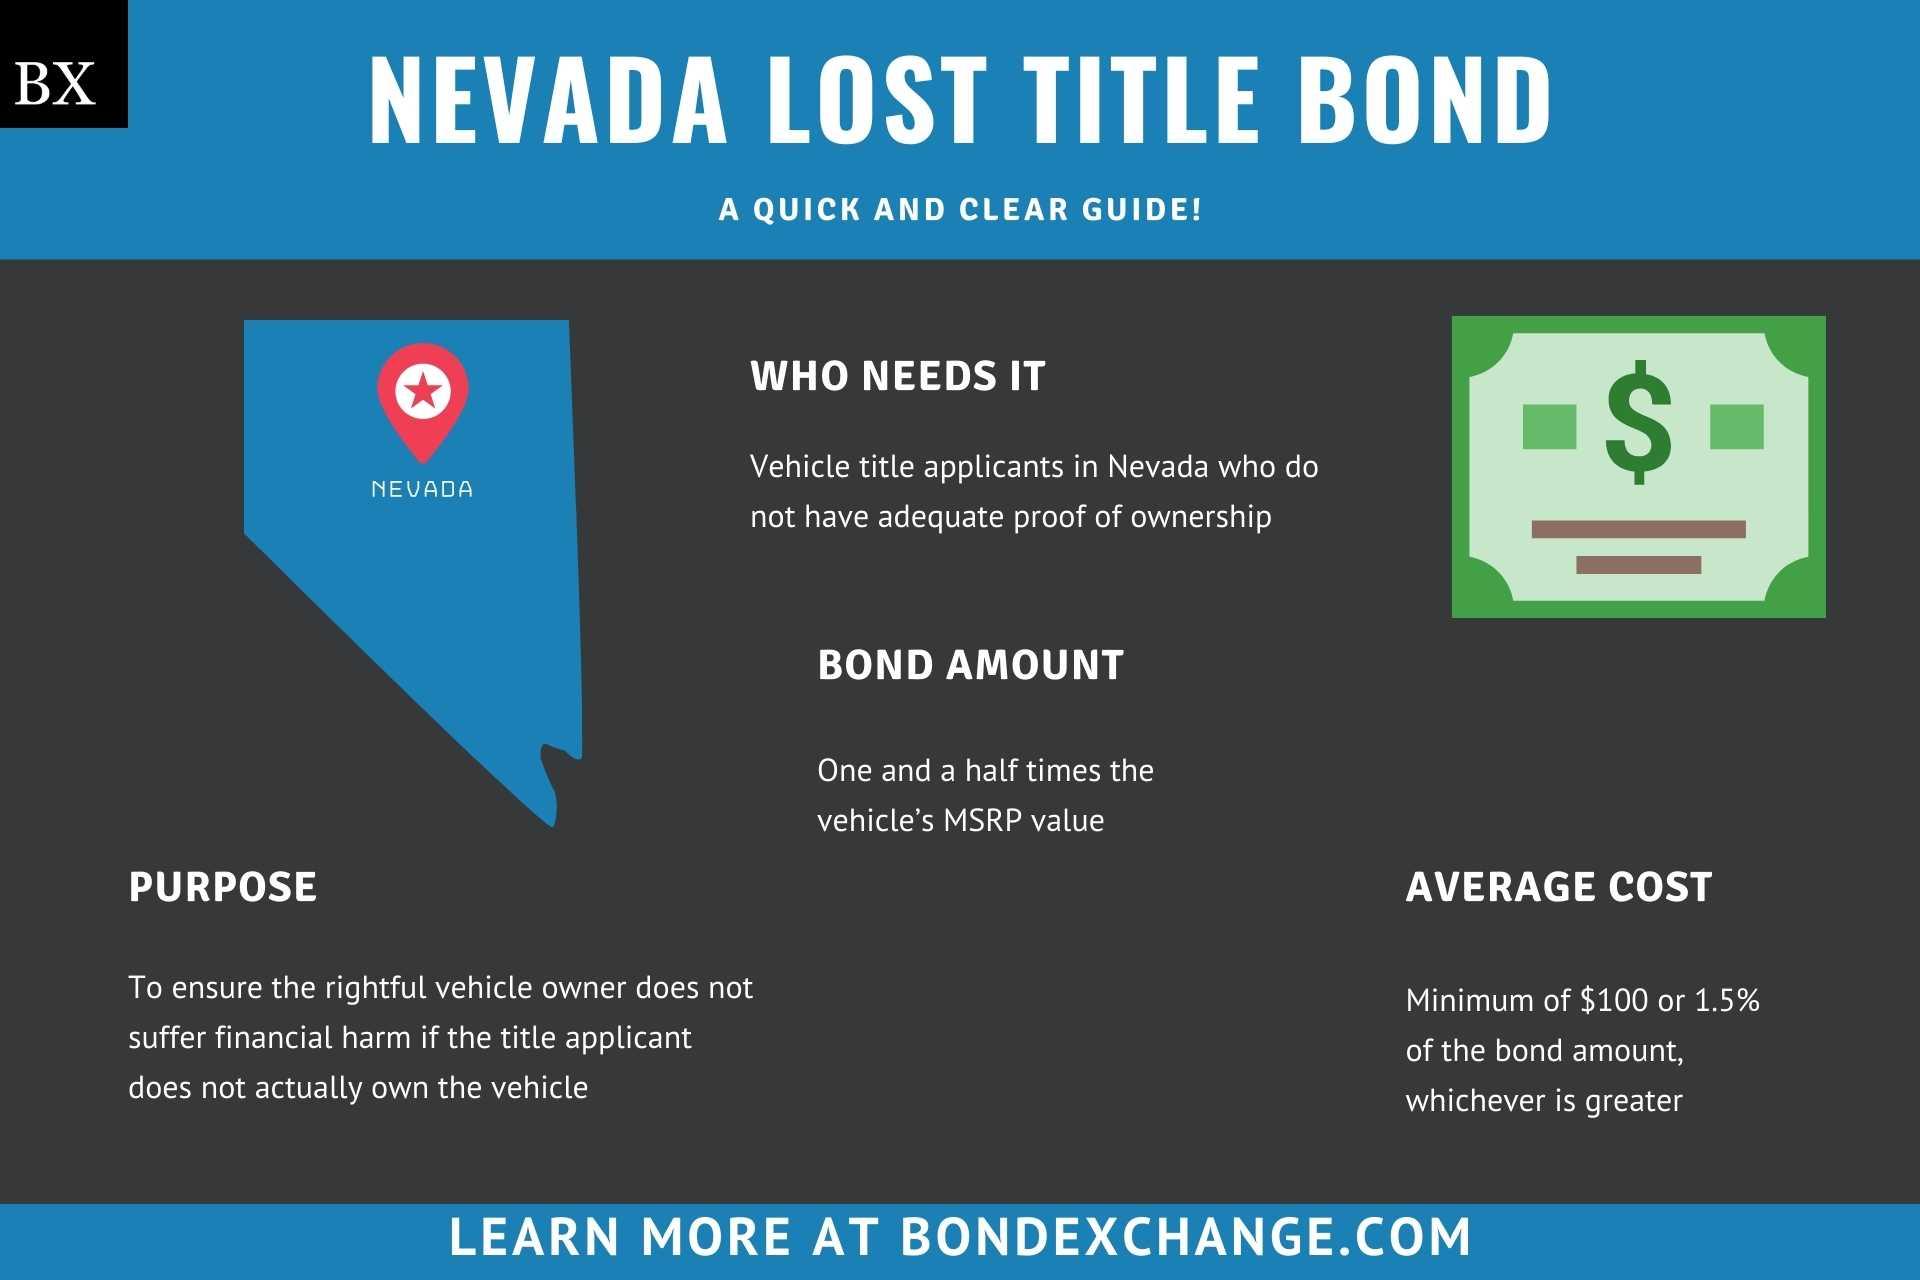 Nevada Lost Title Bond